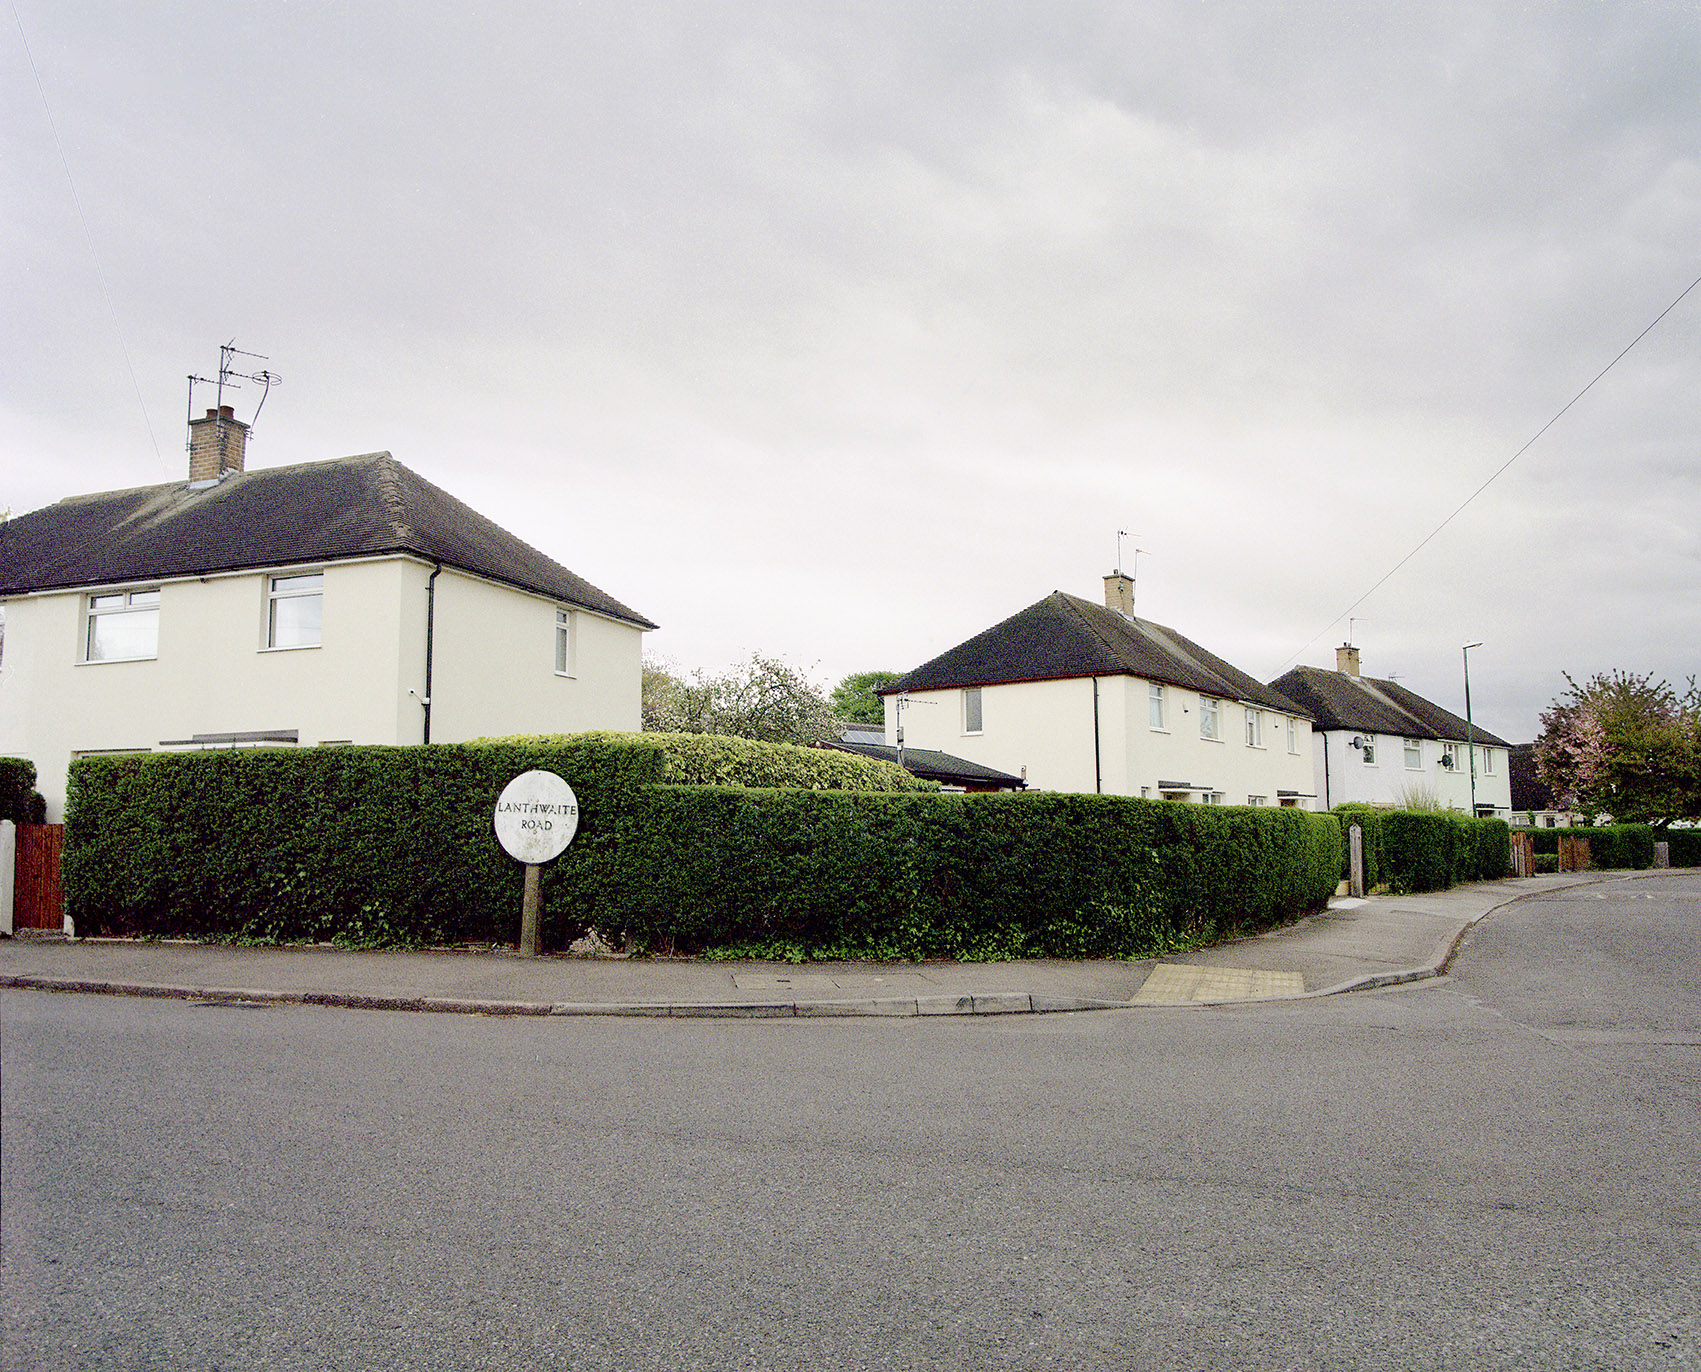 Image of semi detached housing